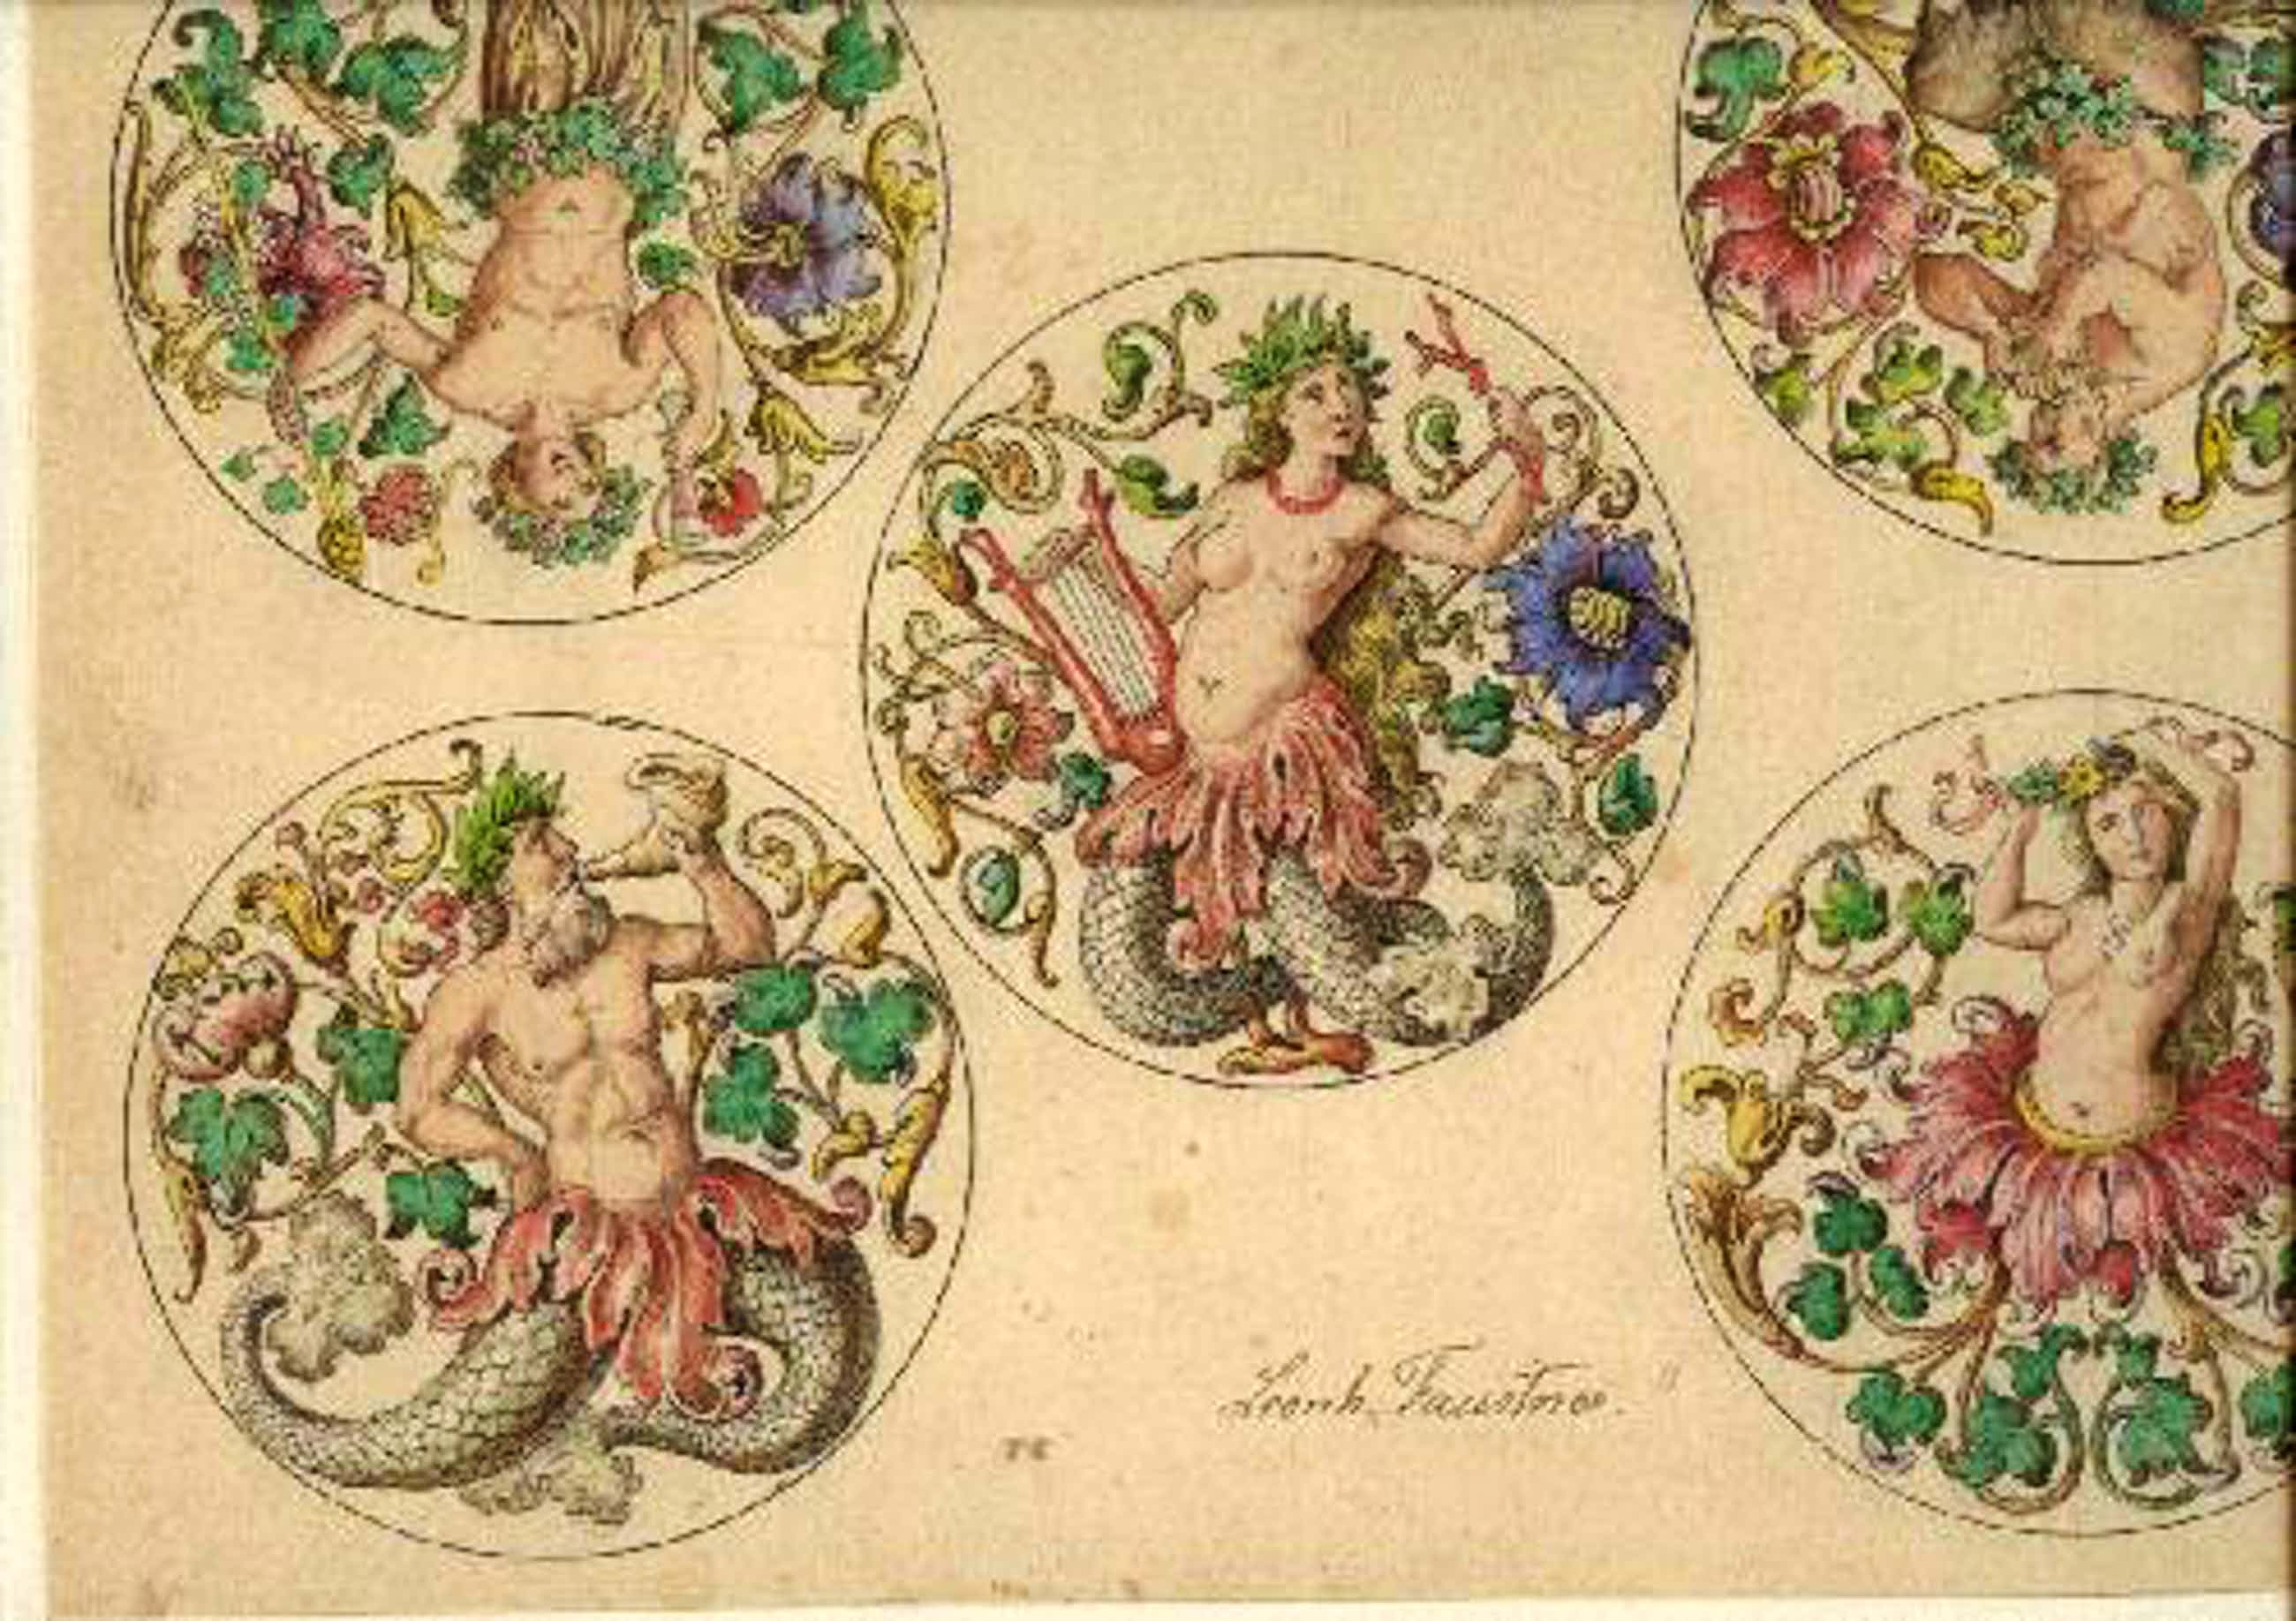 Leonhard Faustner - Leonhard Faustner Fünf Rundfelder mit Fabelwesen signierte Zeichnung /Aquarell kopen? Bied vanaf 900!